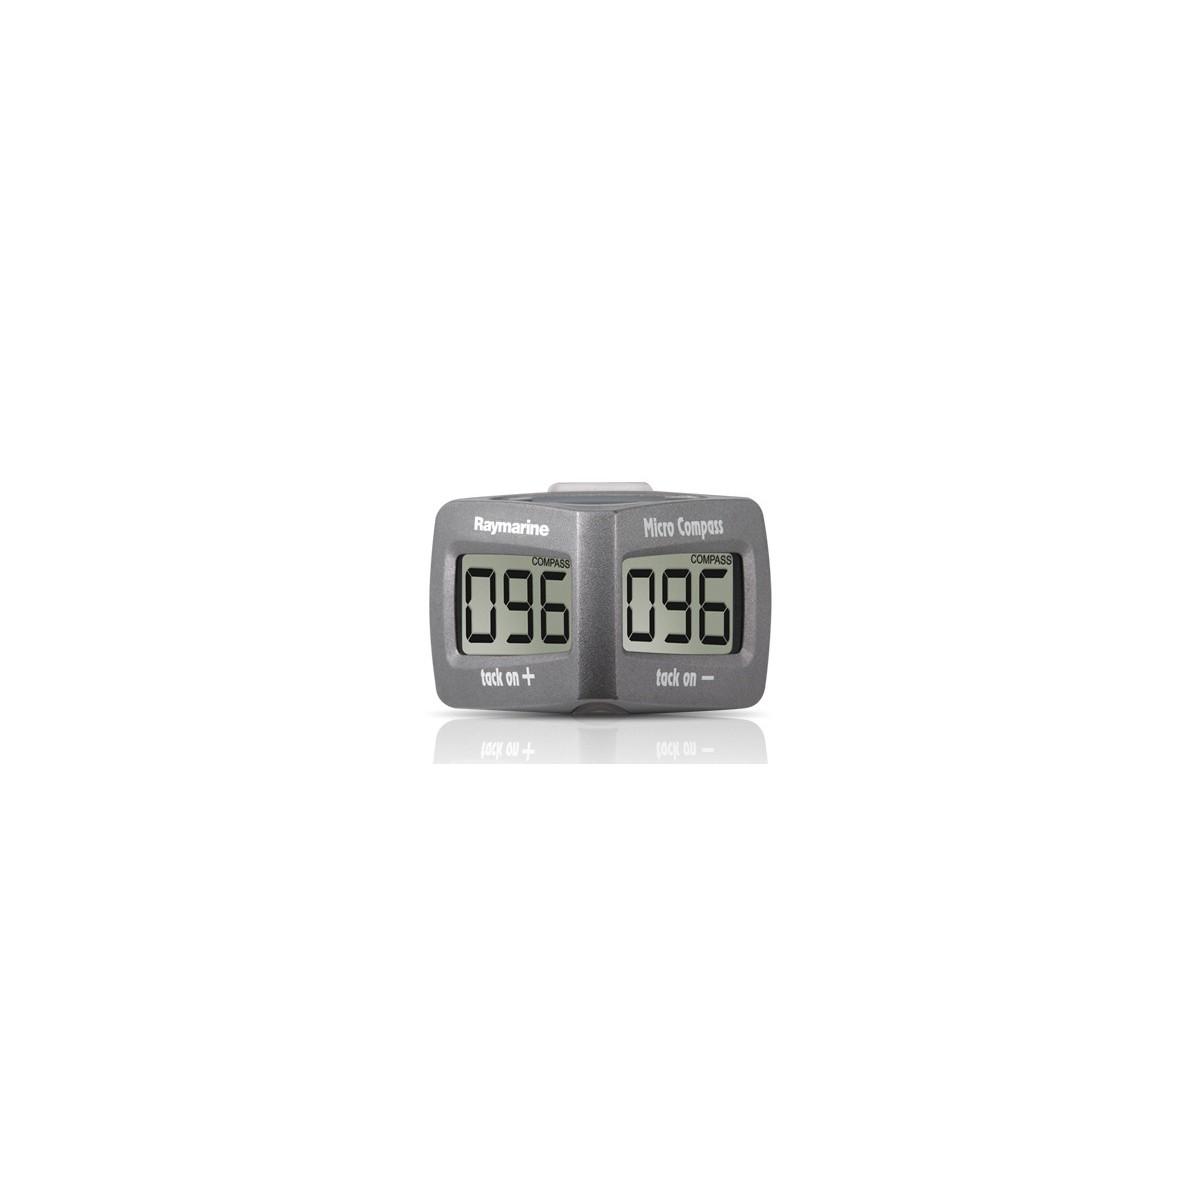 Micro Compas T060 Tacktick